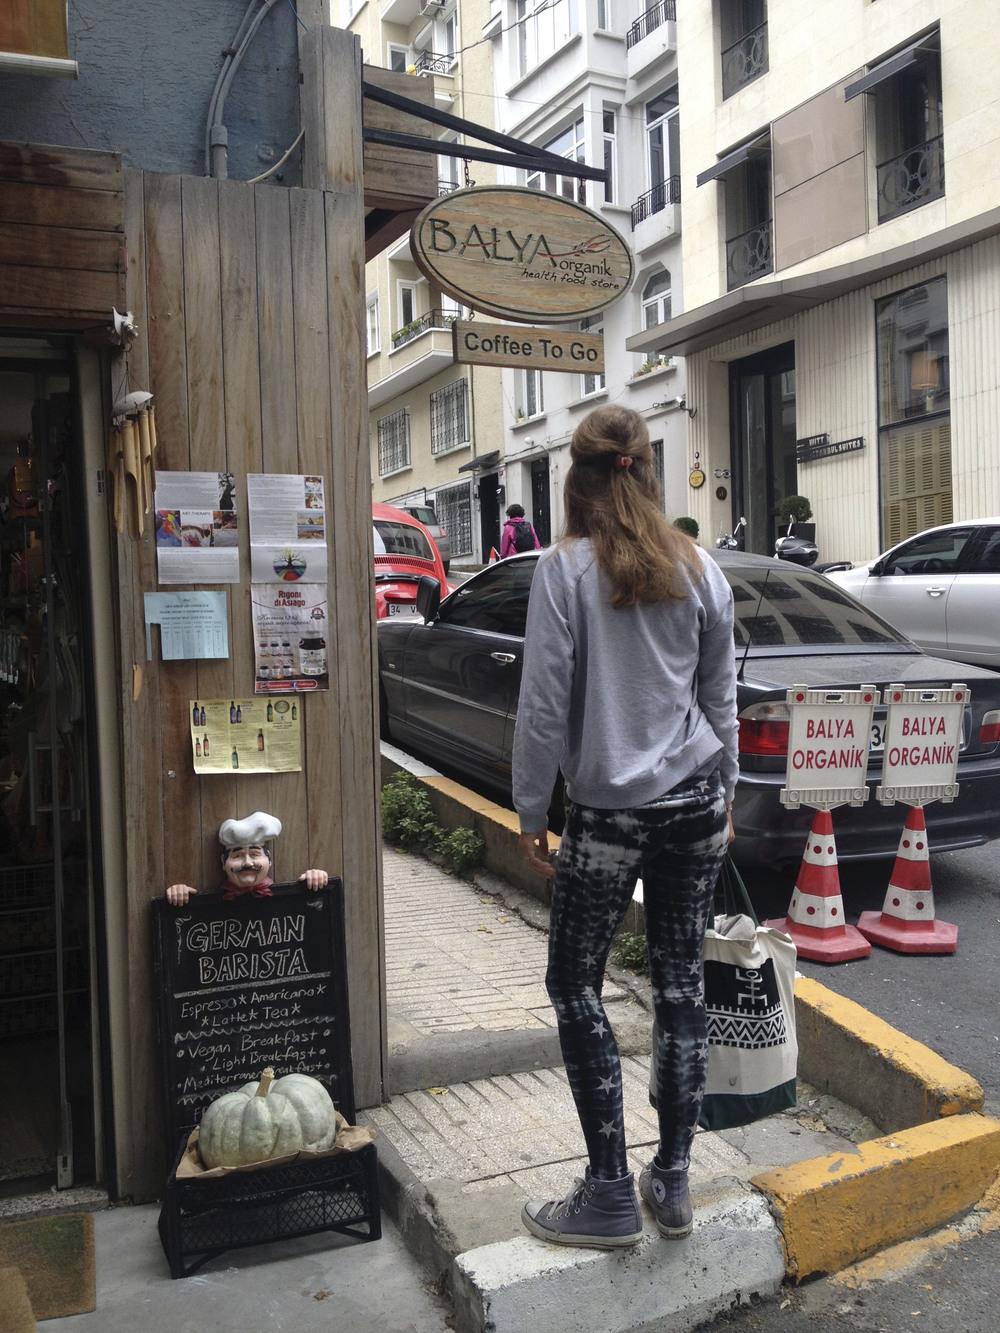 Balya oganic health food store, cihangir, istanbul2914.jpg